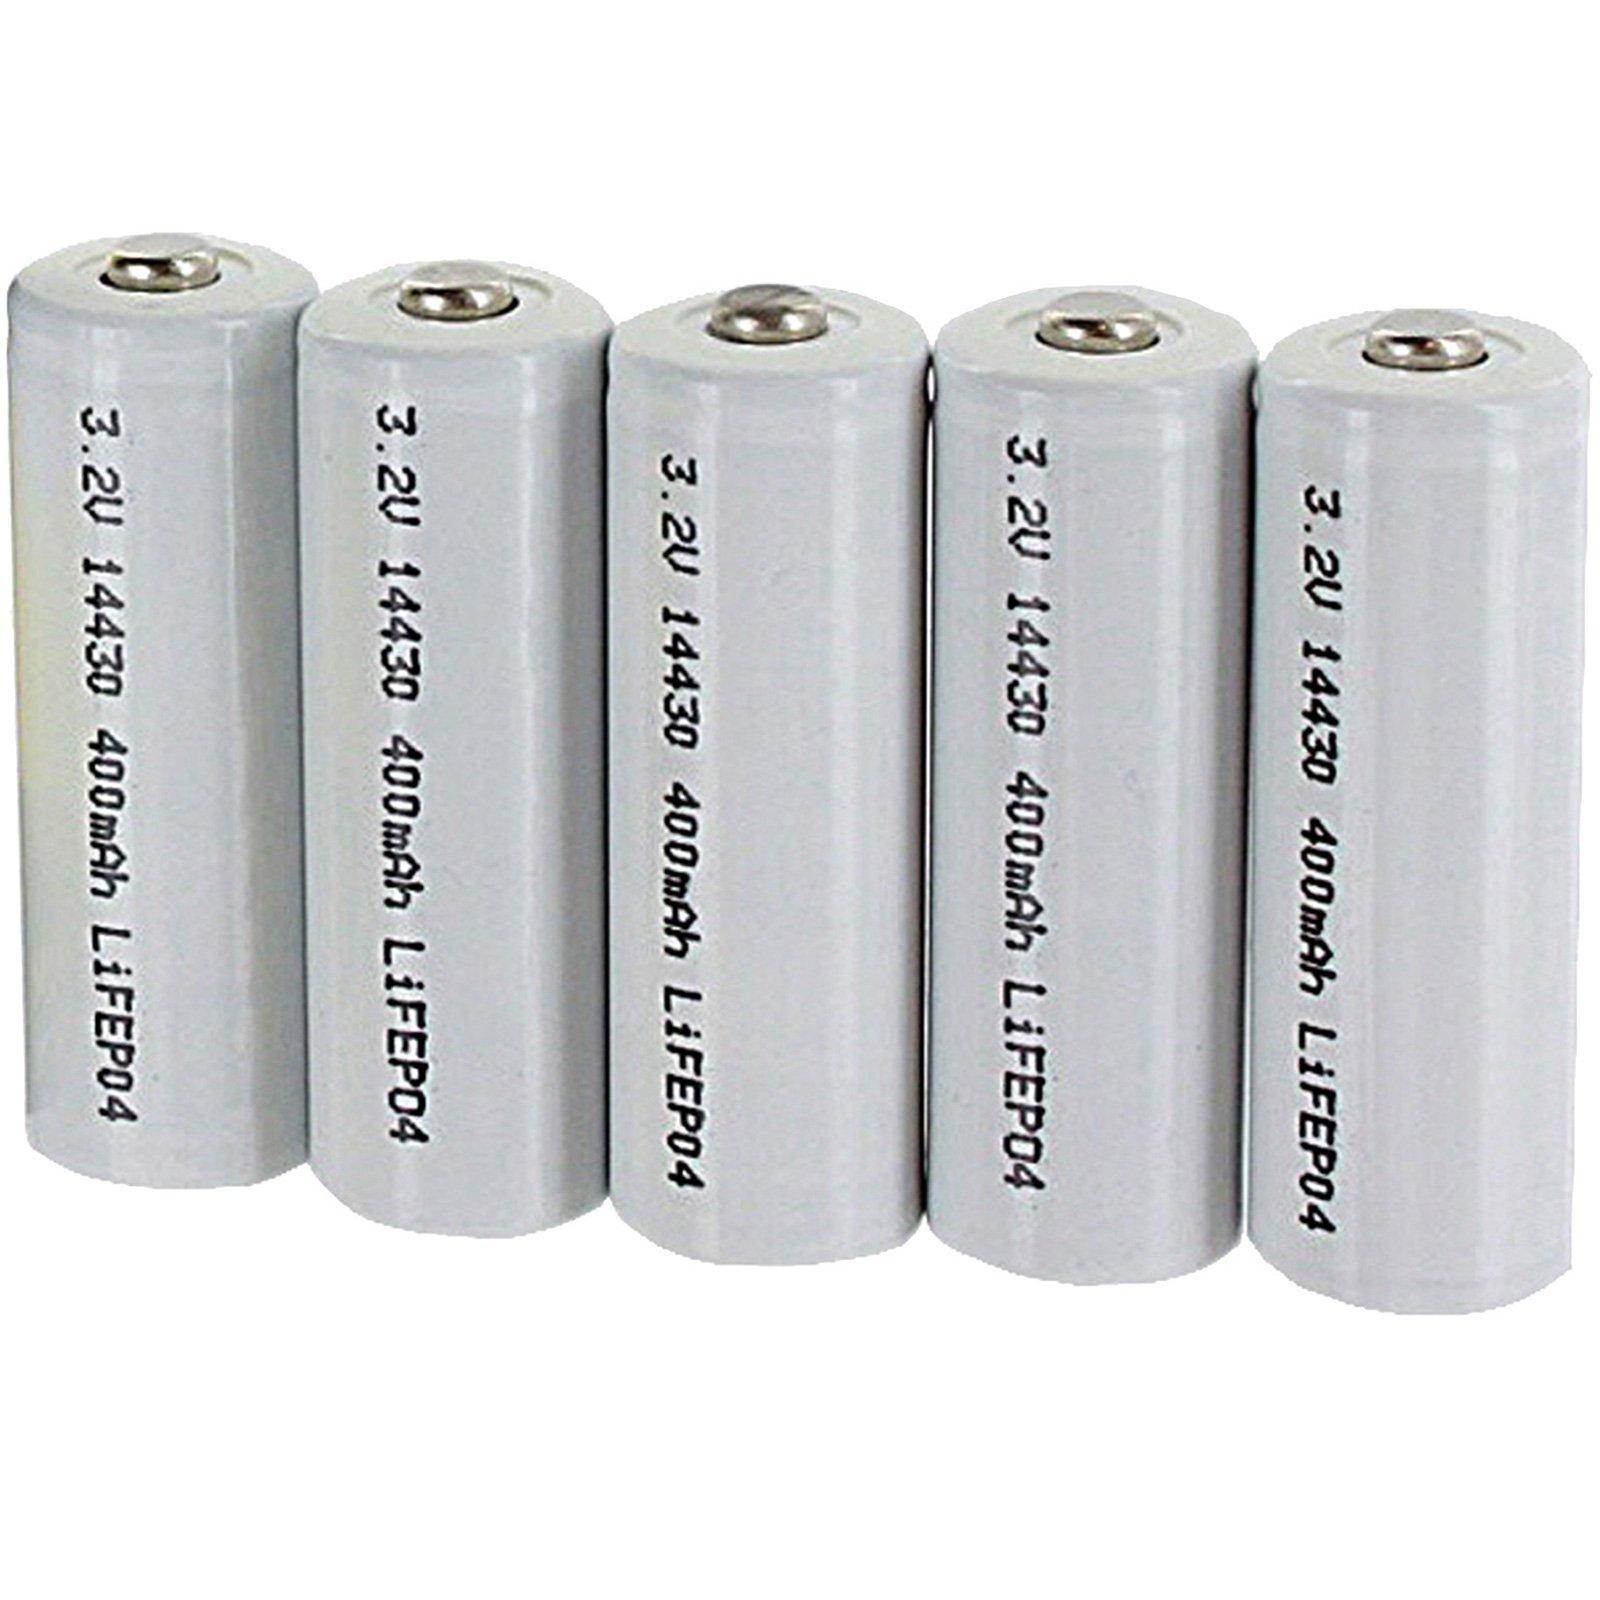 5pk Li-FePO4 Size 14430 Rechargeable 3.2V 400mAh Batteries For Solar Lights Garden Lights , Security System Panels, LED Flashlights FAST USA SHIPPING